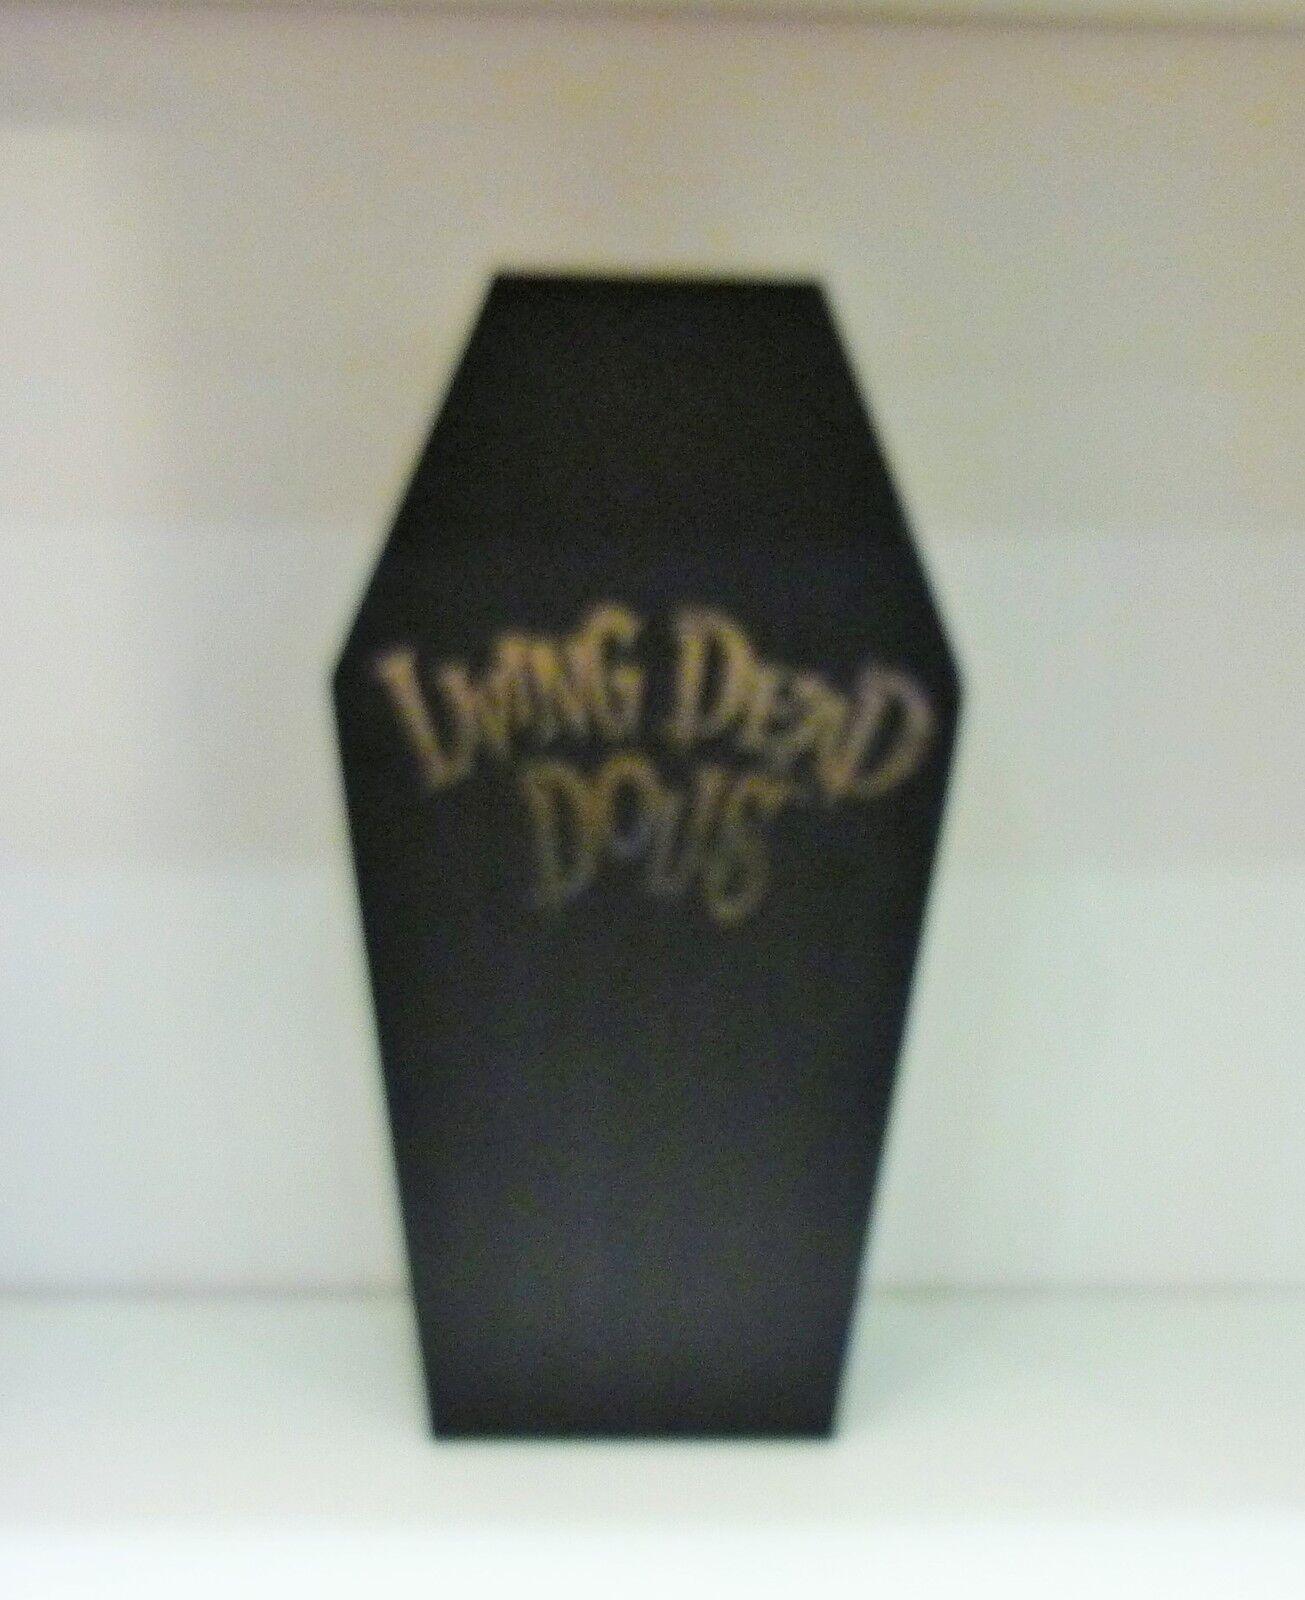 POUPEE LIVING DEAD DOLLS AGANA AGANA AGANA b0e119